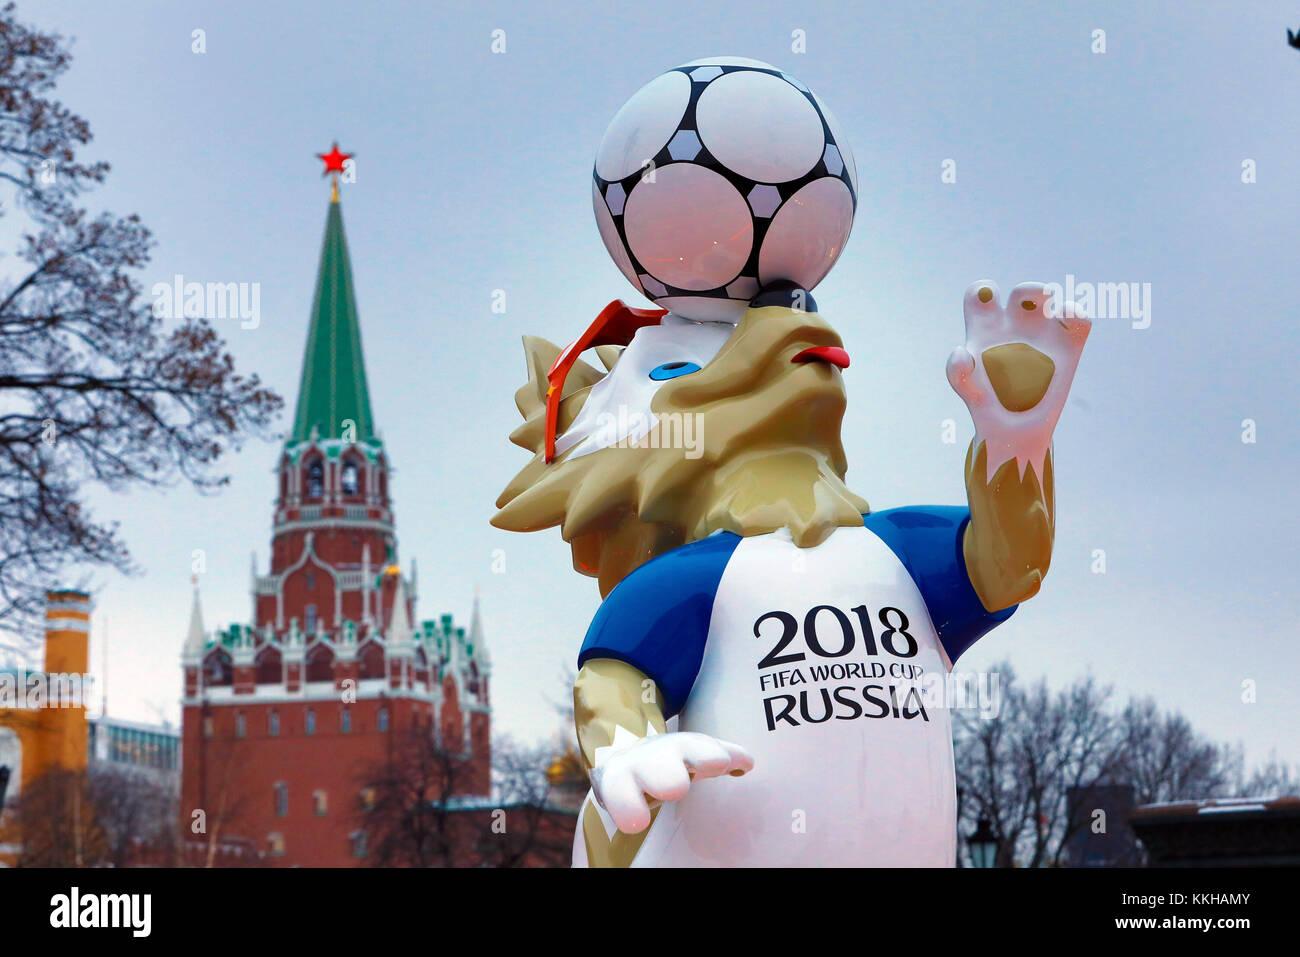 Moskau, Russland. 29th Nov, 2017. Der Kreml with dem Wolf Zabivaka, Maskottchen der Fussball- WM 2018. Feature/Schmuckbild/Hintergrund/Hintergrundbild. Fussball: Auslosung zur FIFA- Fussball Weltmeisterschaft 2018 in Moskau, Russland 01.12.2017 - Football, Draw for the FIFA- World Cup 2018, Moscow, December 01, 2017 |usage worldwide Credit: dpa/Alamy Live News Stock Photo